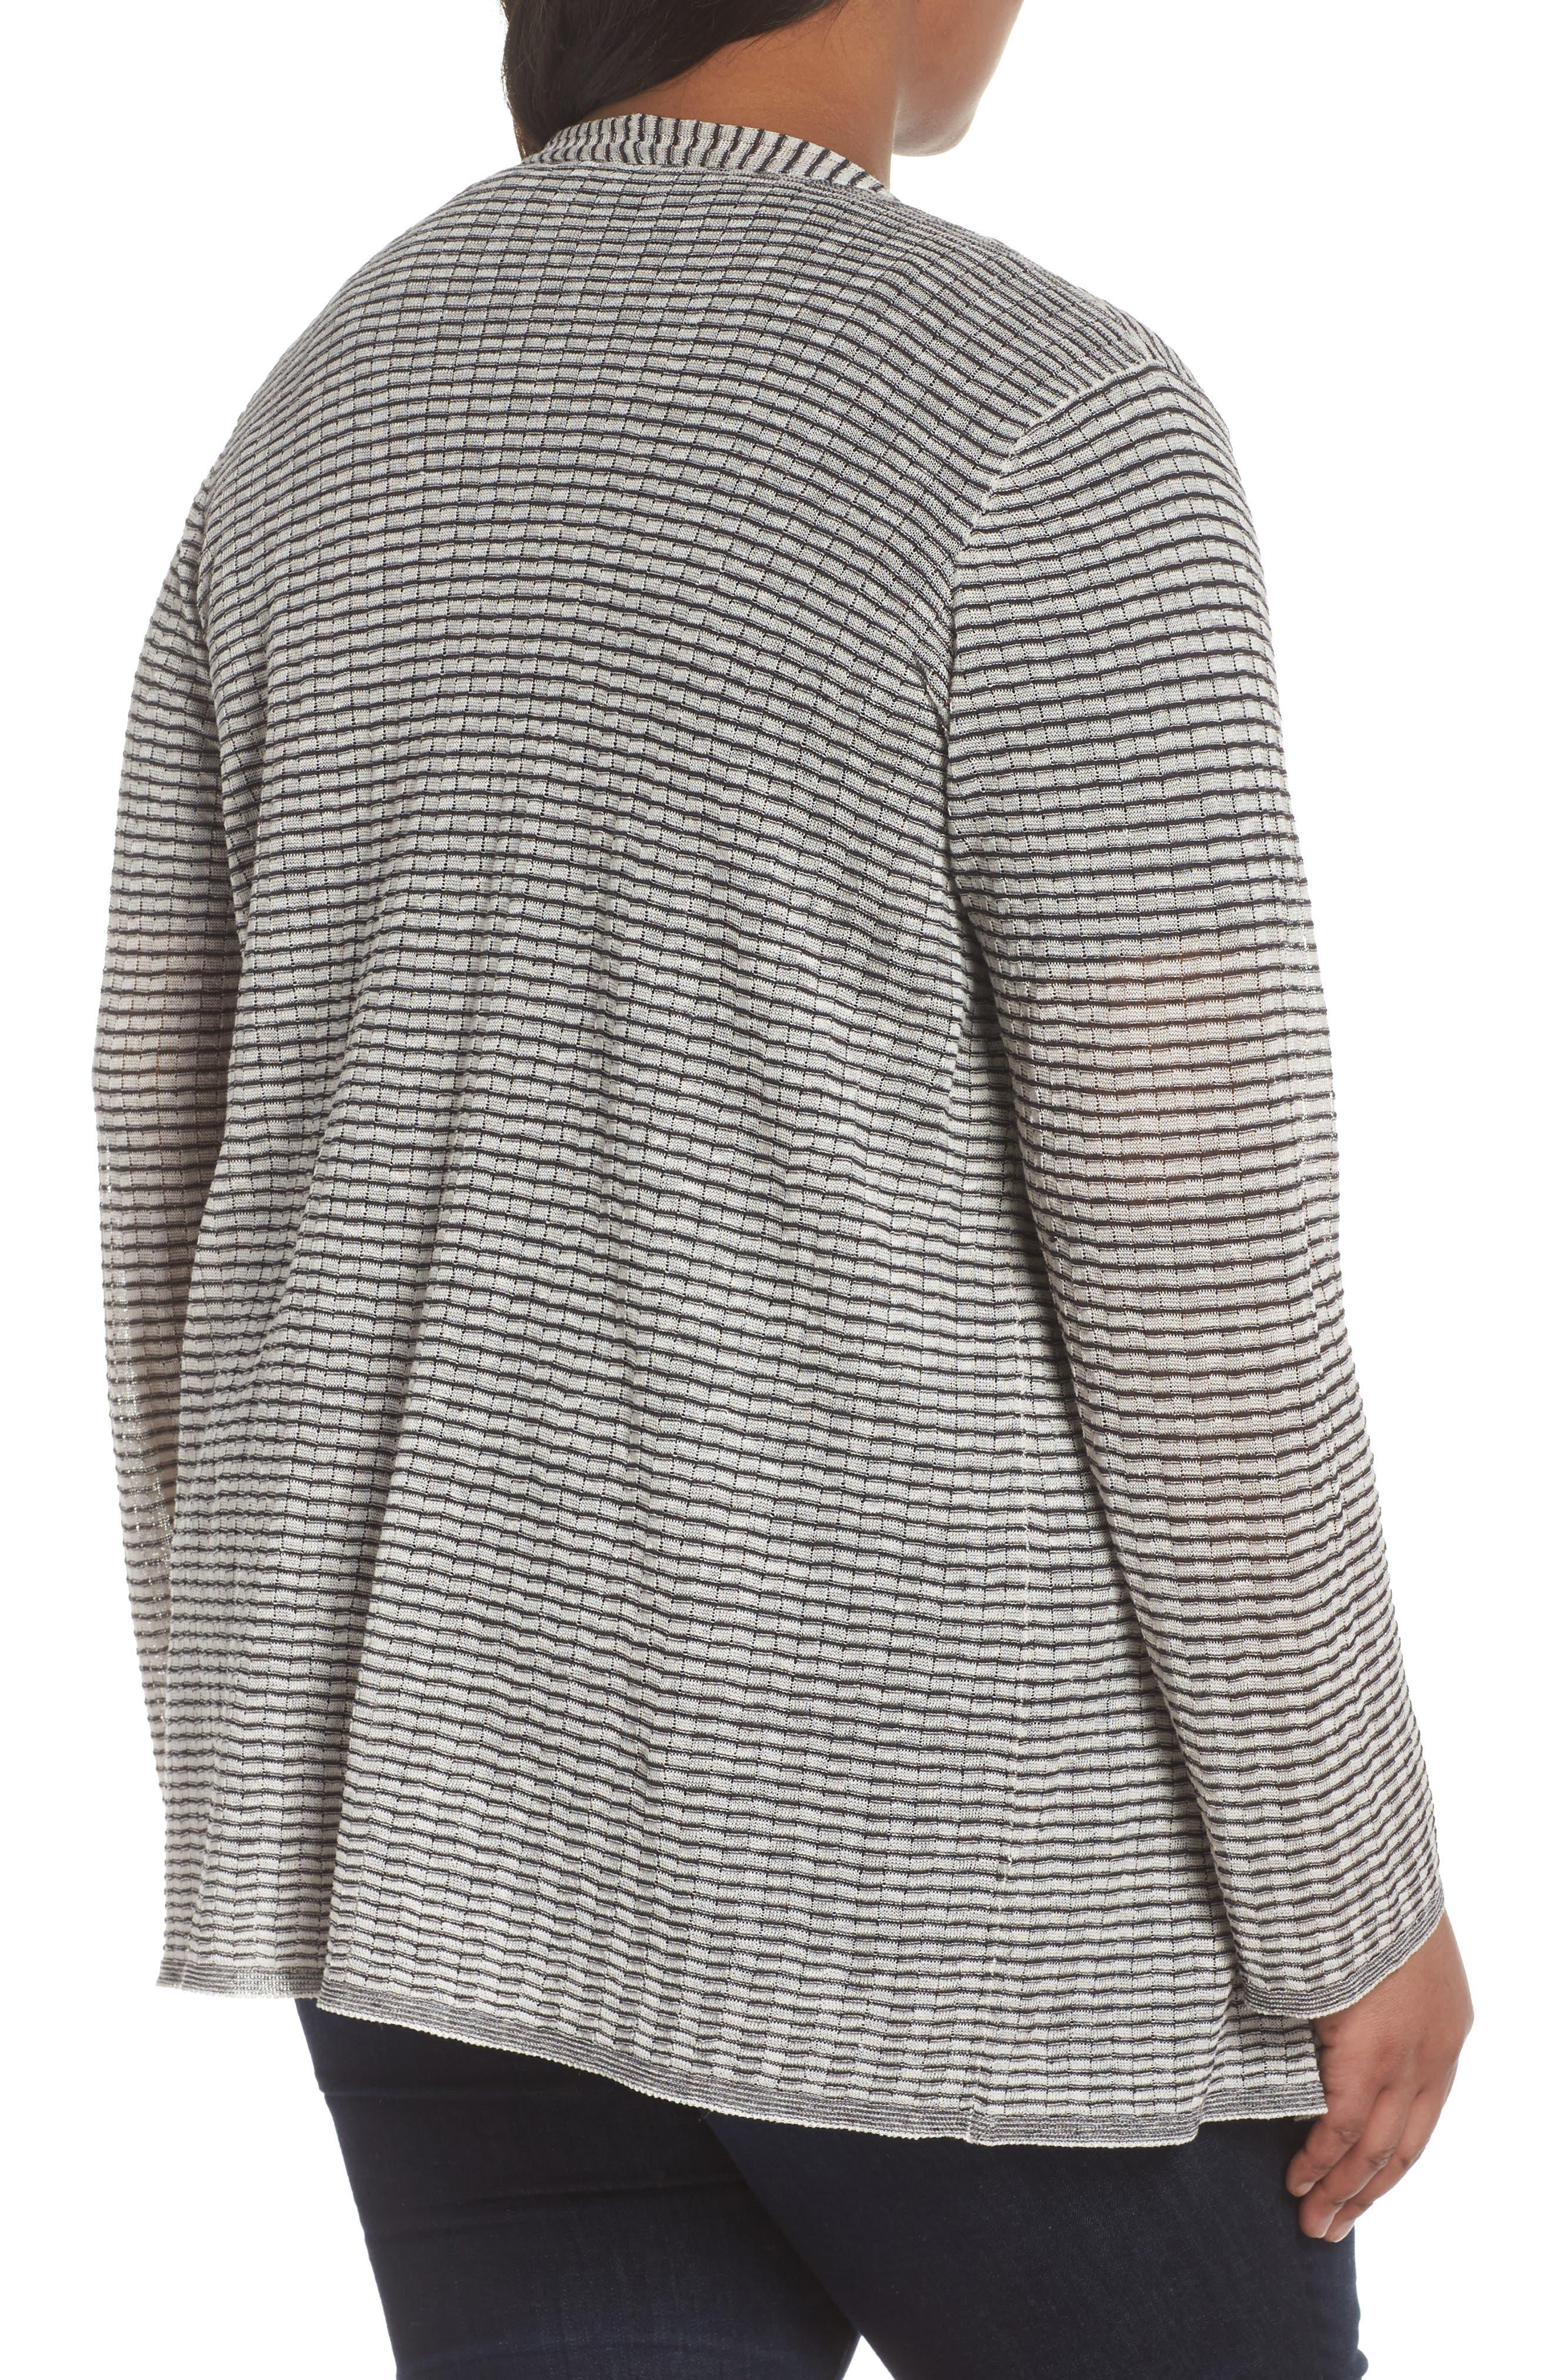 Simple Stripe Linen Blend Cardigan,                             Alternate thumbnail 2, color,                             Graphite/ Bone